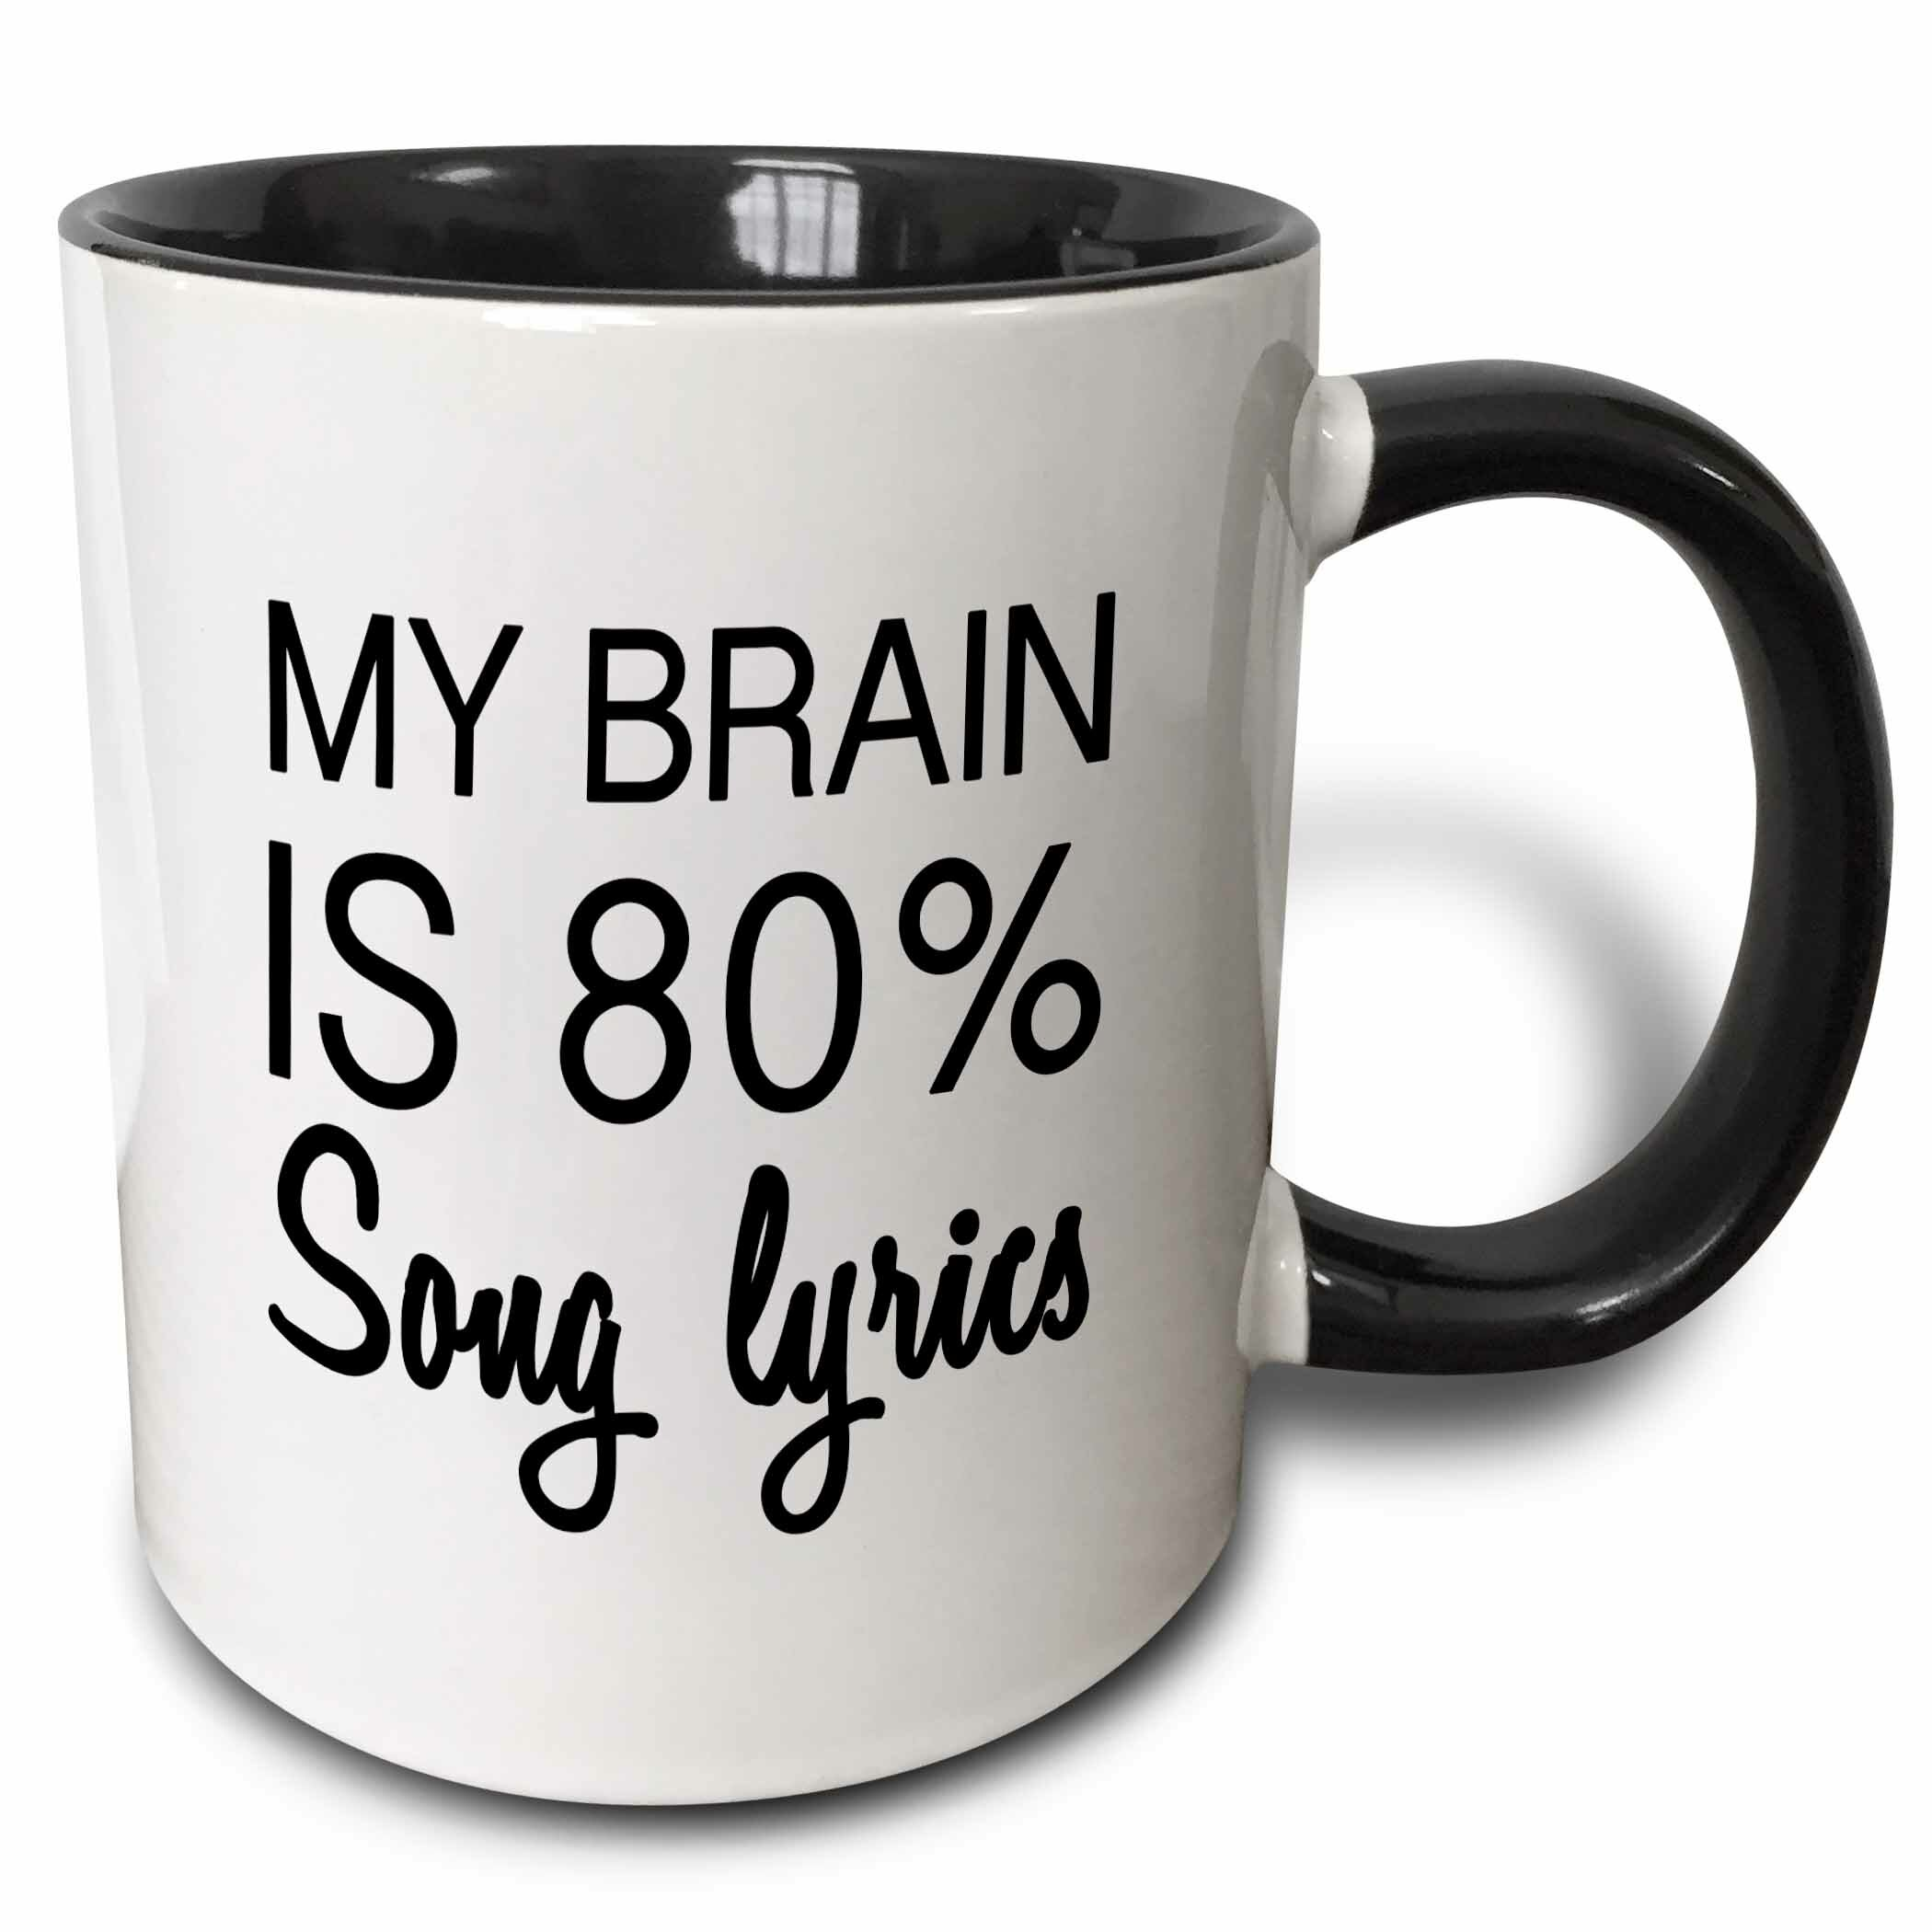 East Lyrics Brain MugWayfair Is Coffee 80 Home Percent Urban Song My 8kNZnP0OwX